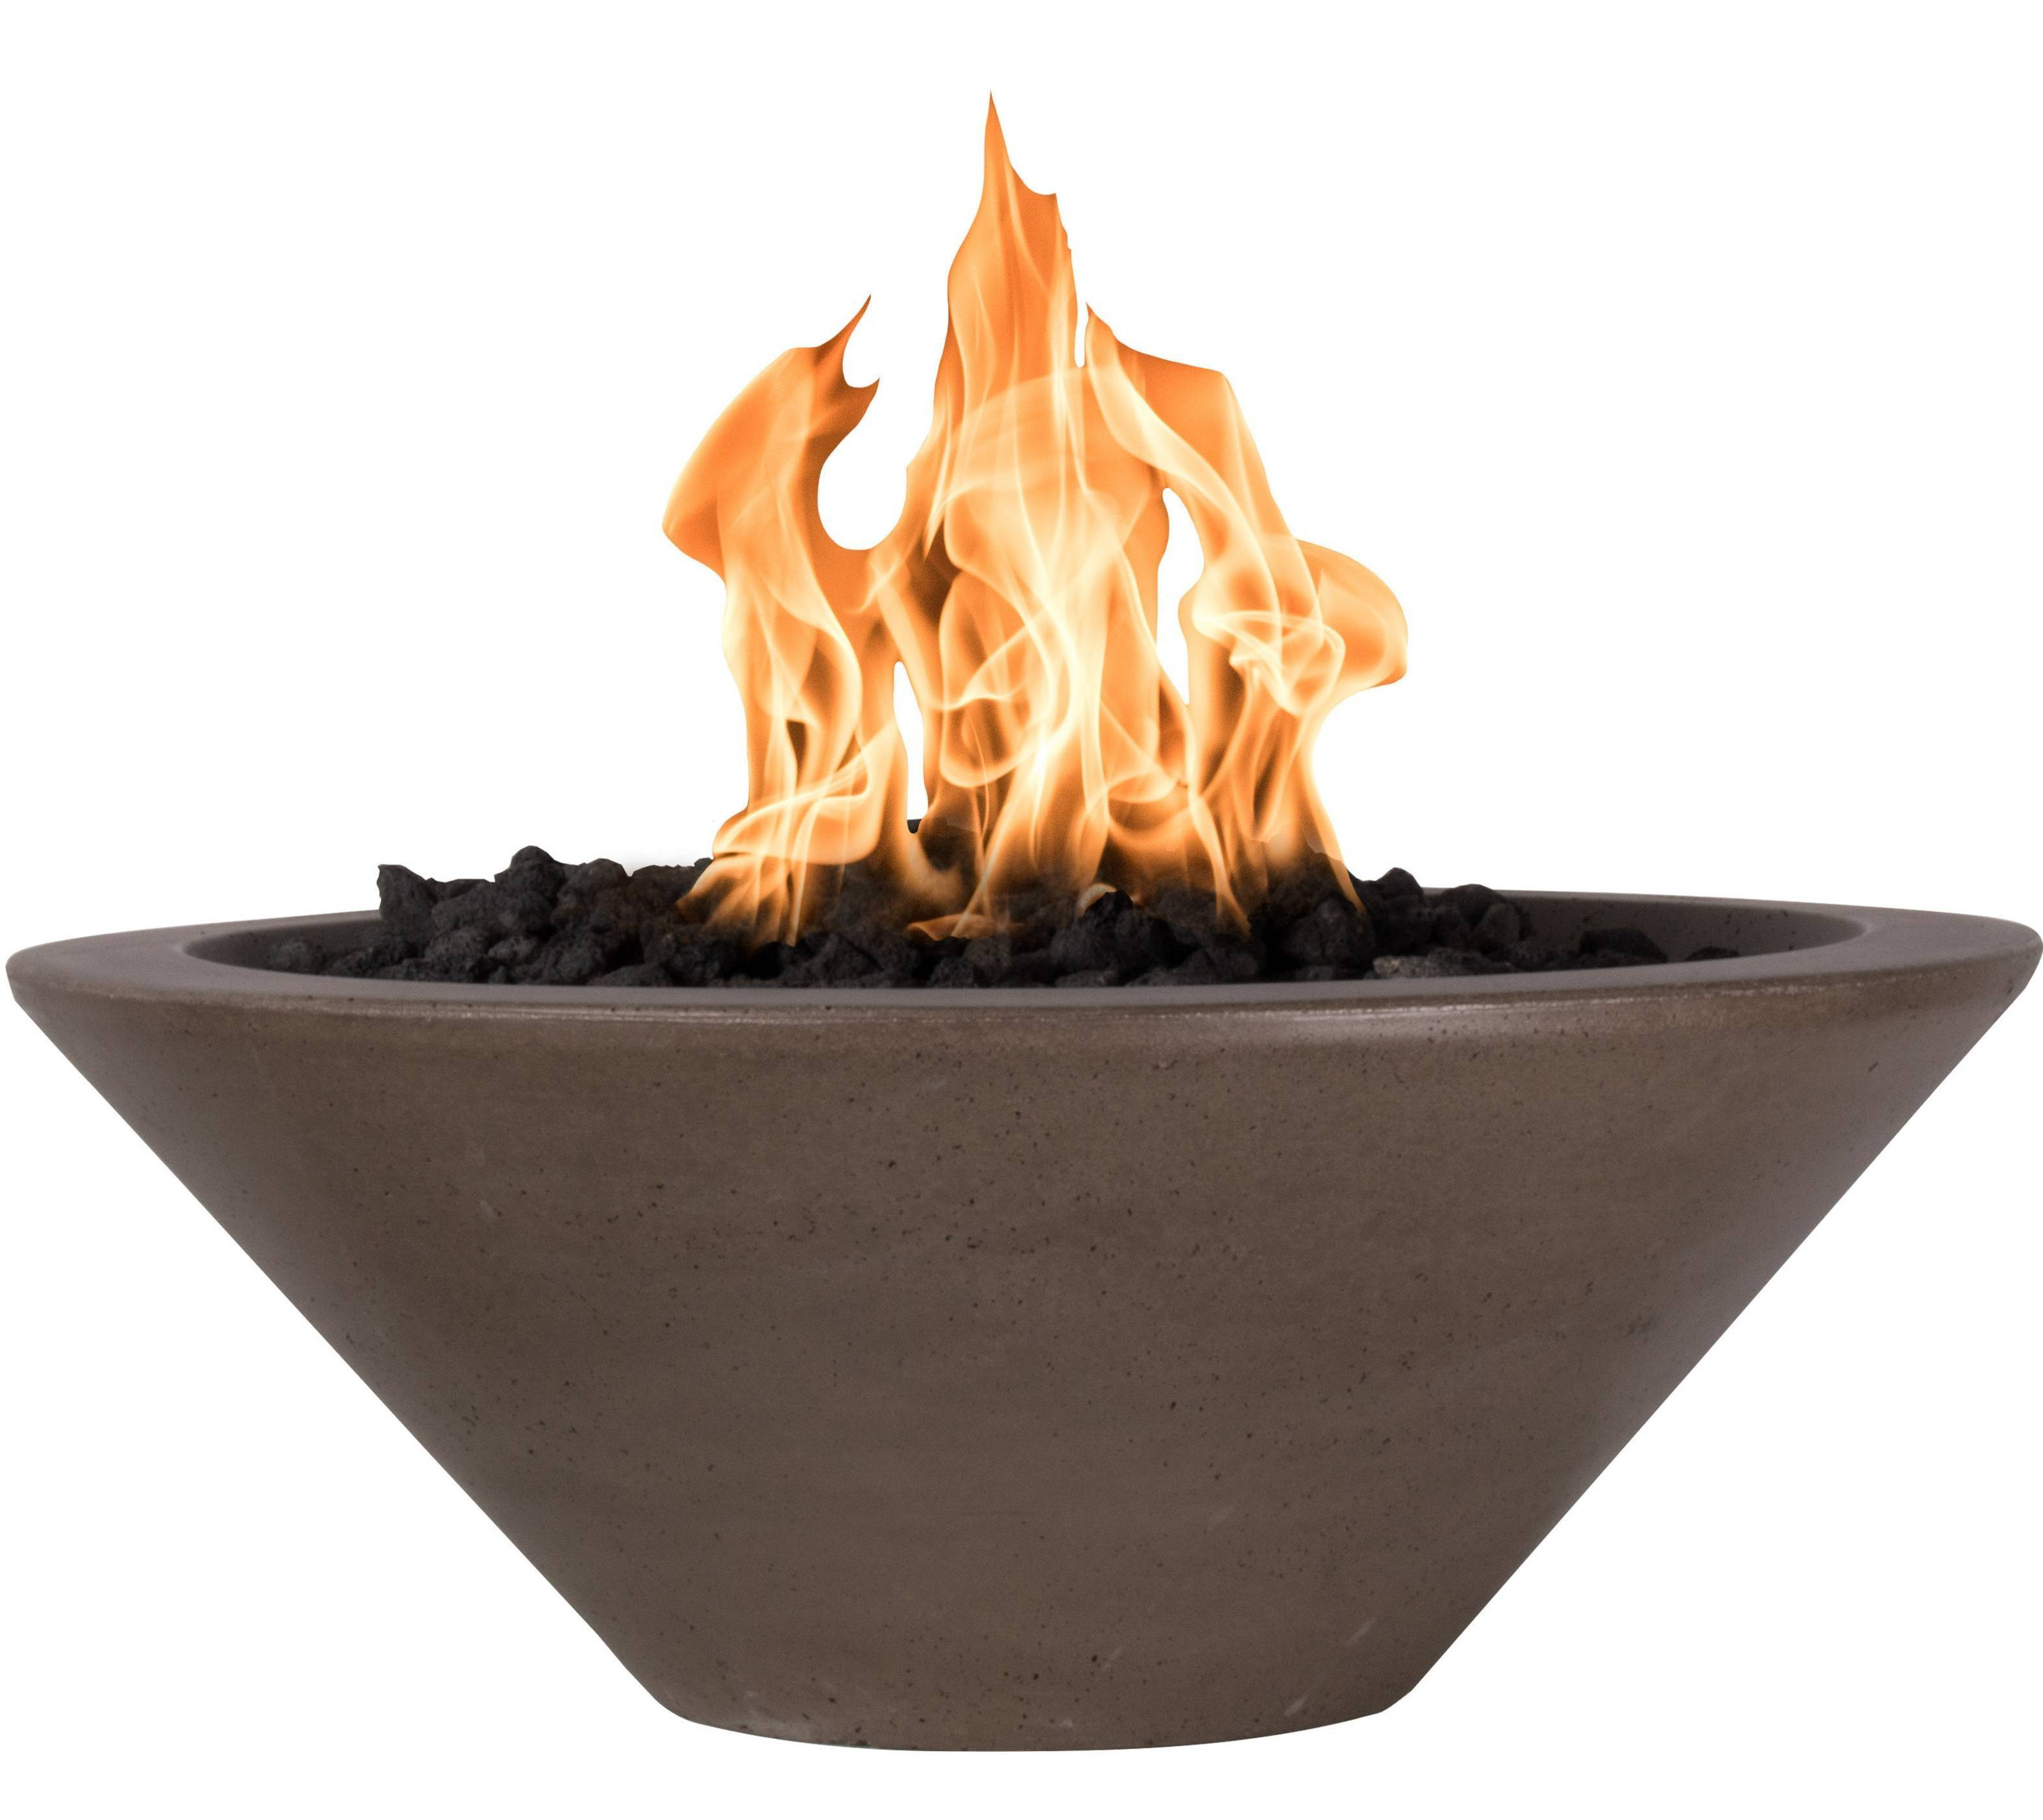 Concrete Fire Bowl WOK Style GFRC | Starting at $1,429